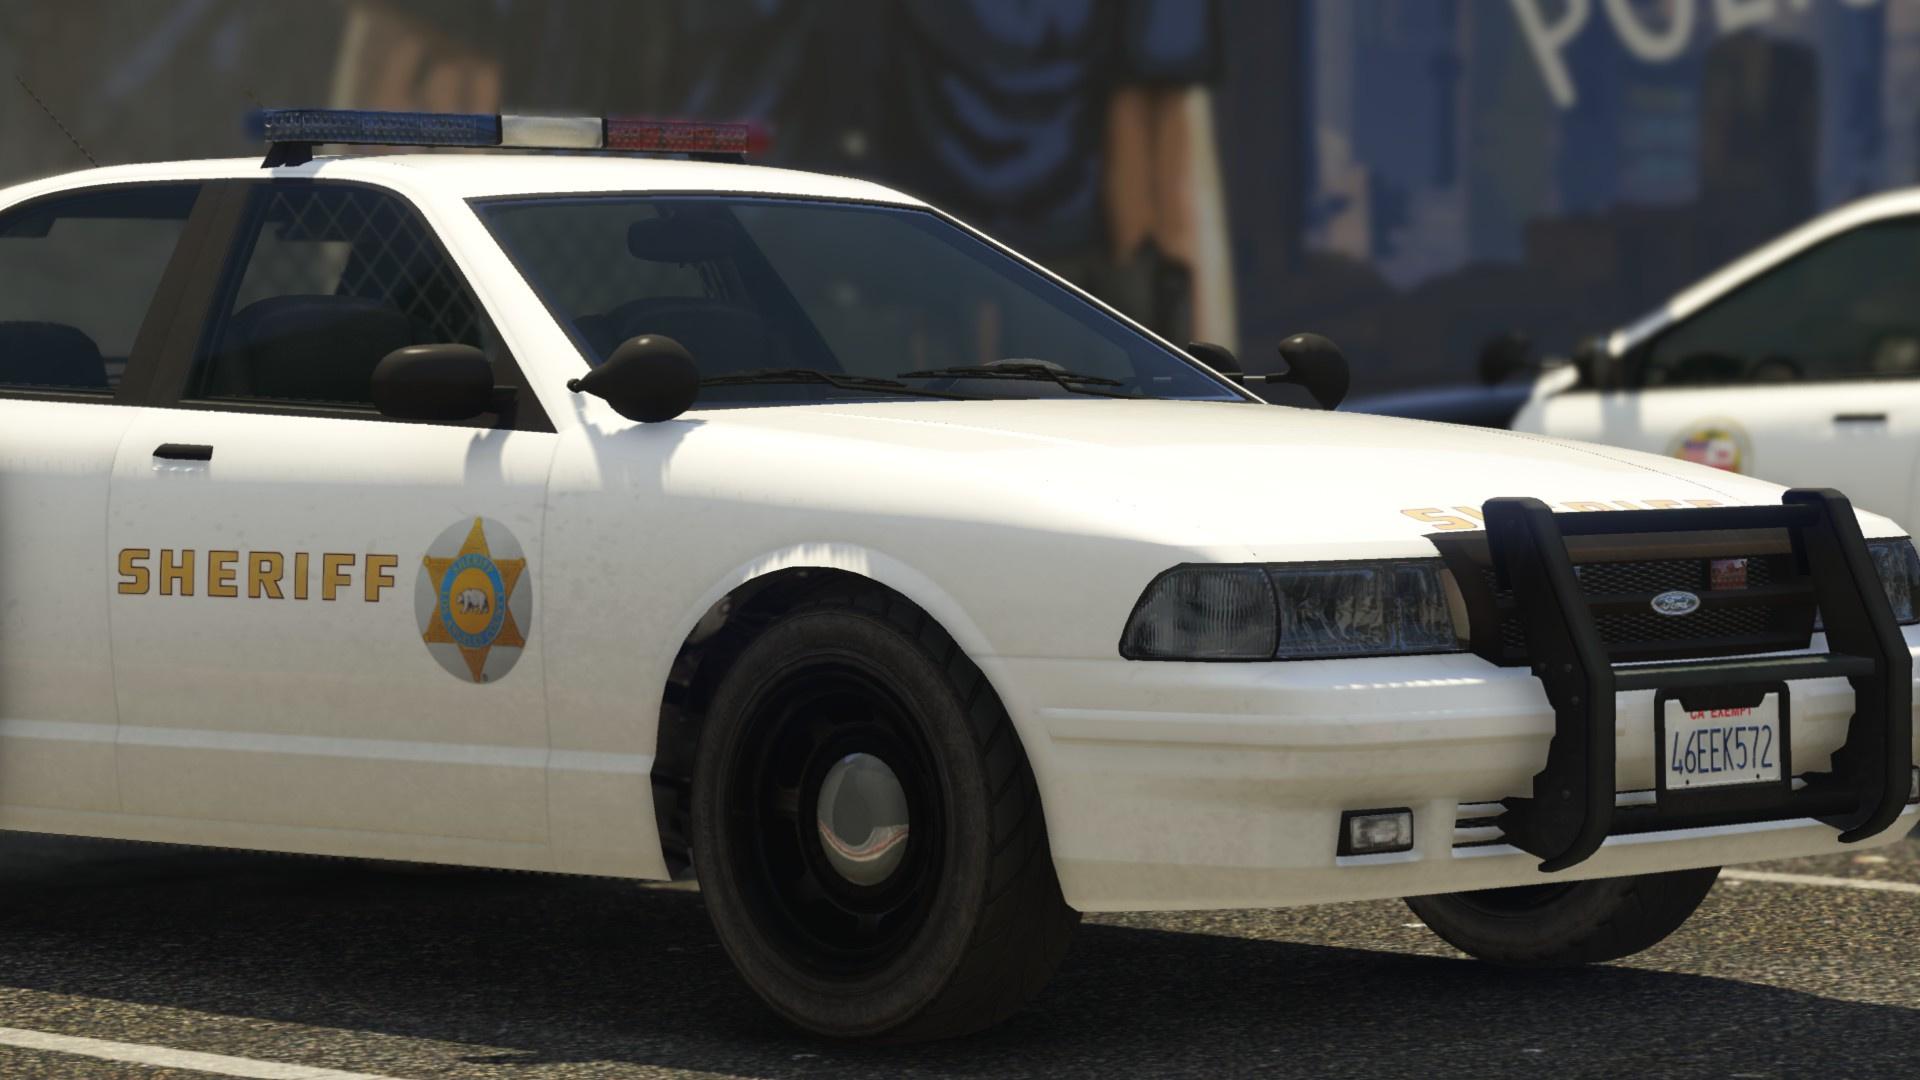 79ece5 2015 05 23 00005 - Gta 5 Police Cars